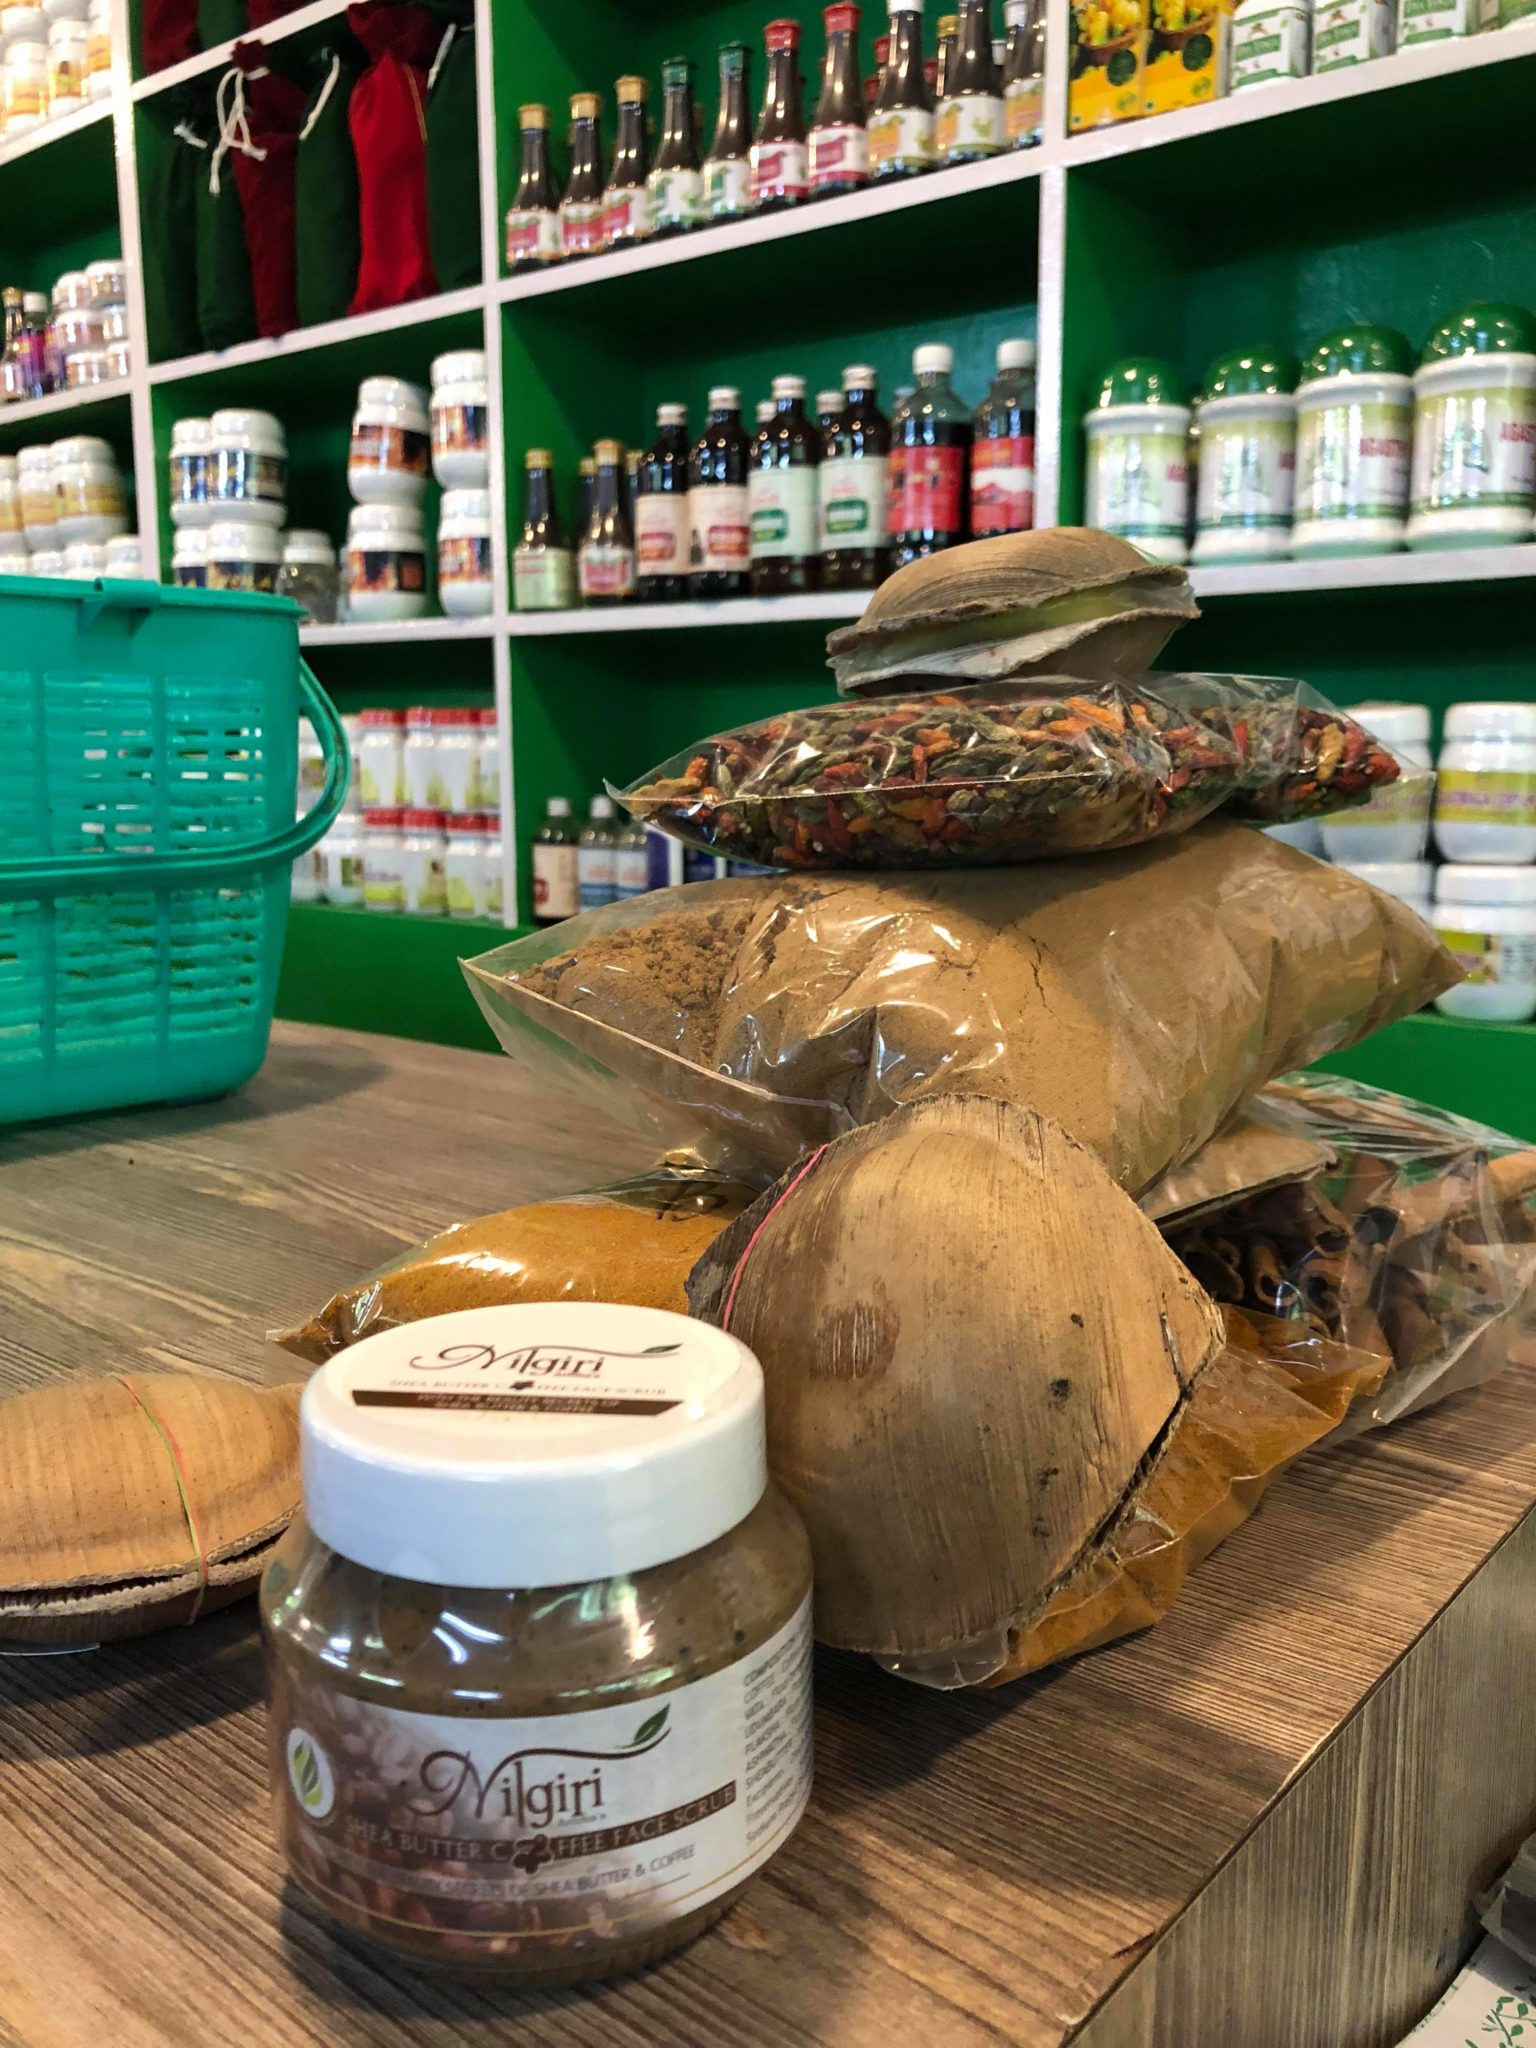 ayurvédique-munnar-kerala-produits-épices-cure